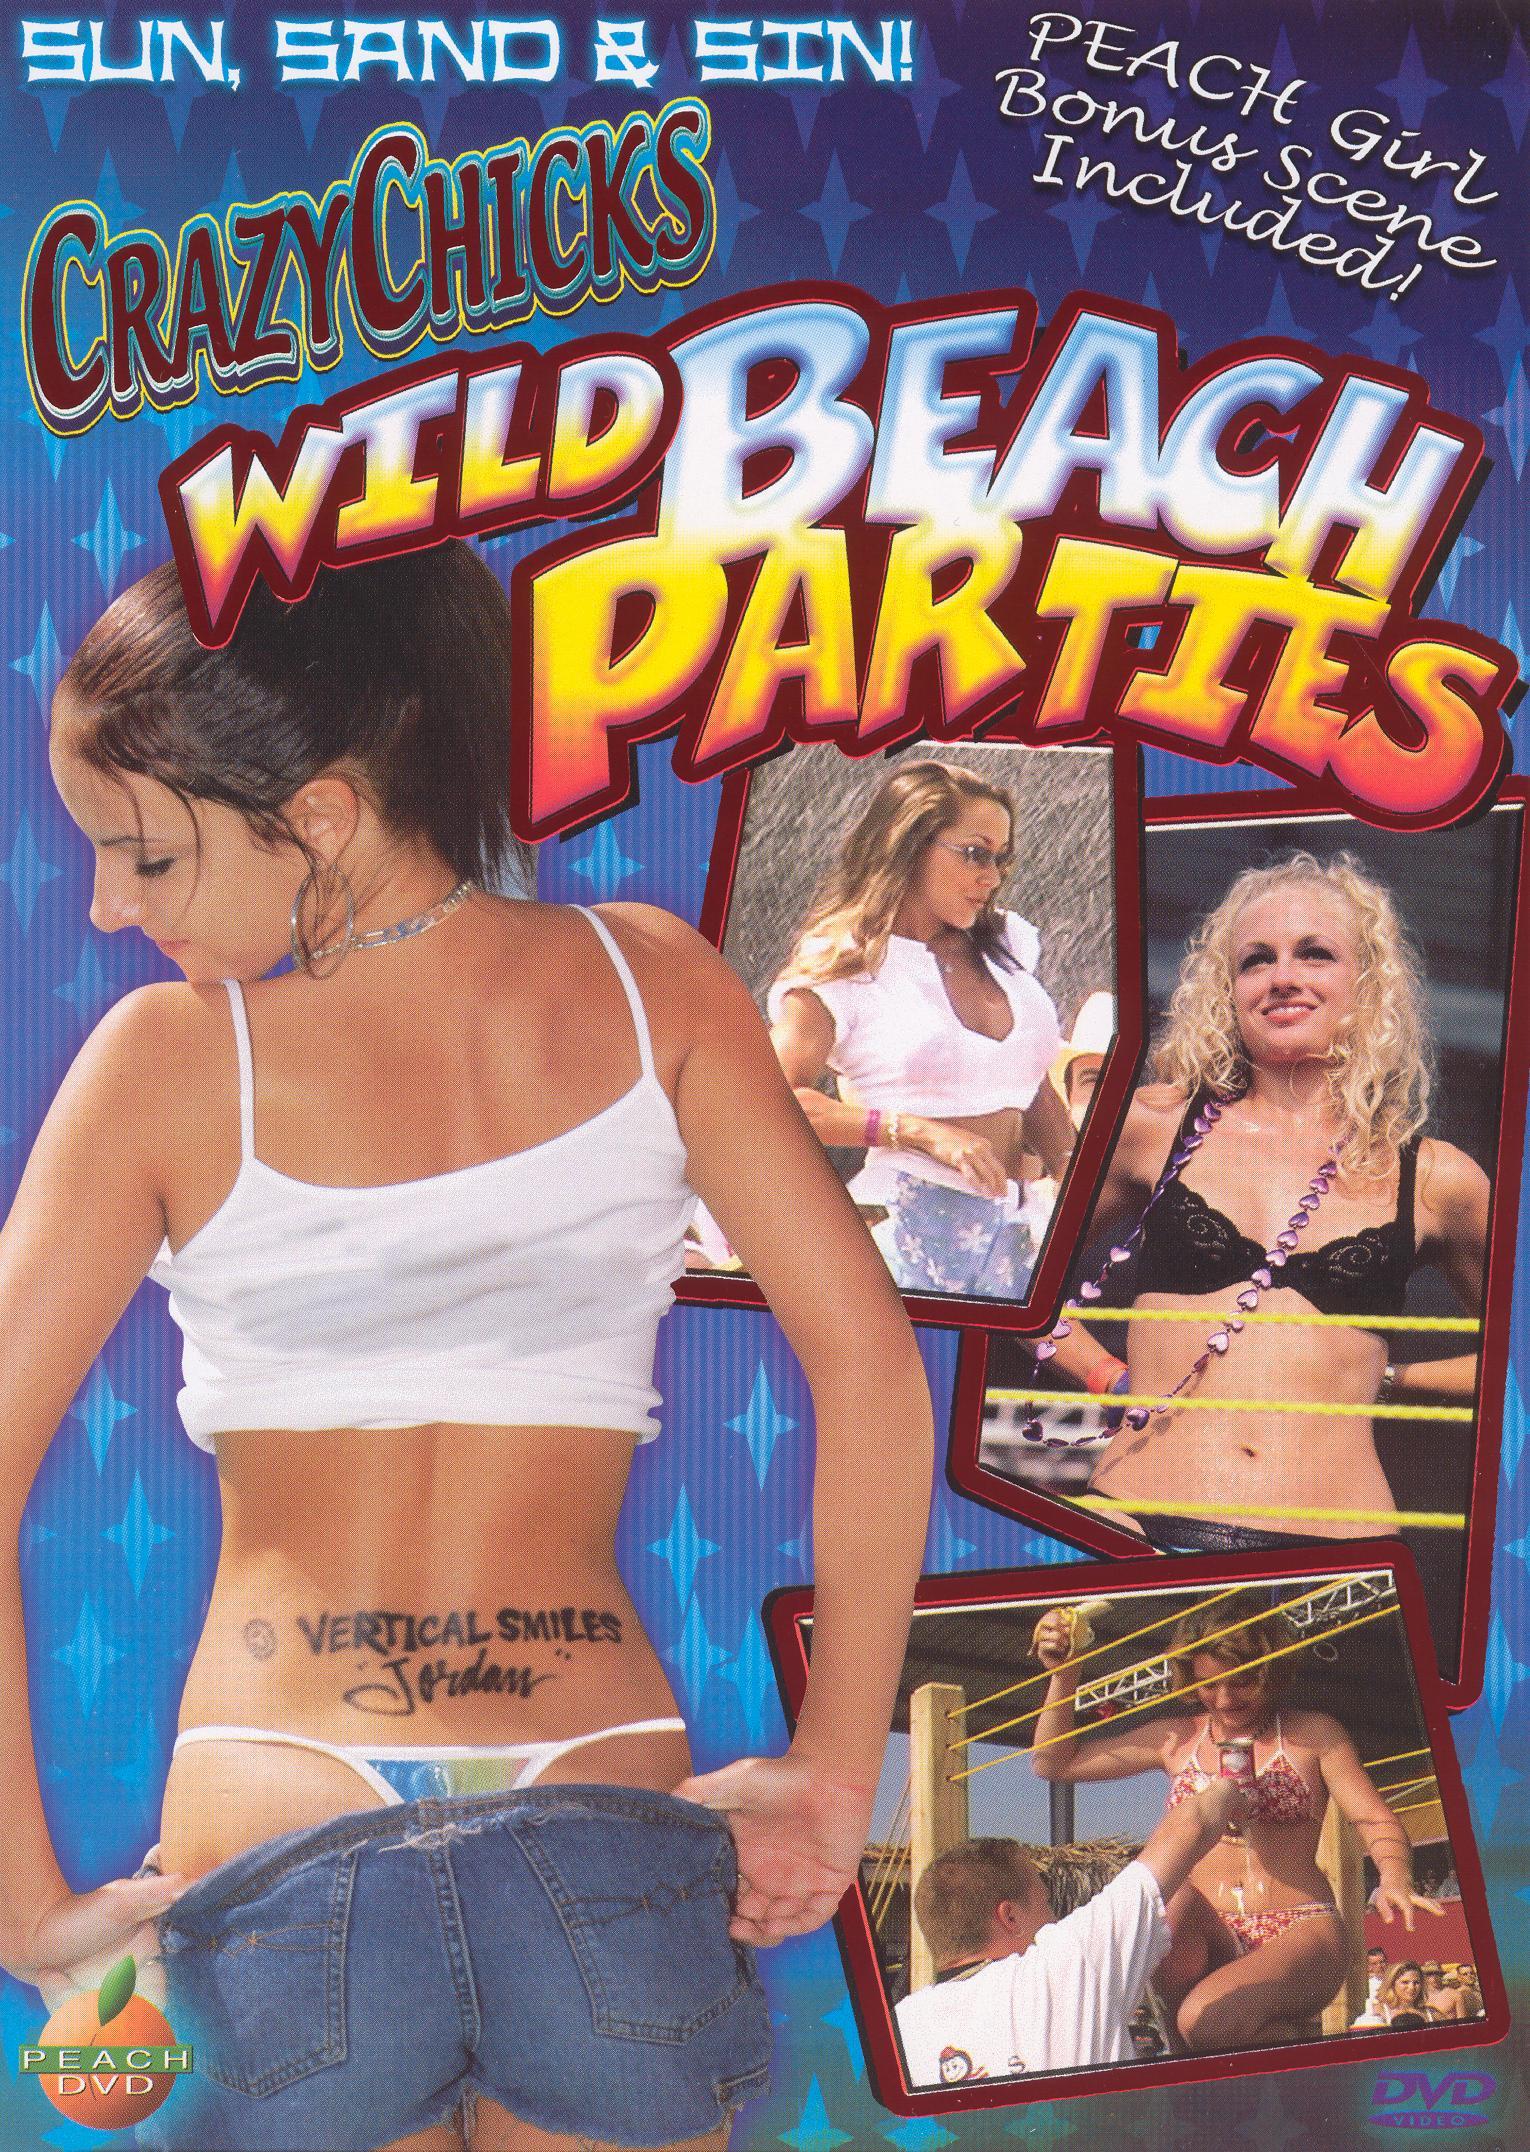 Crazy Chicks: Wild Beach Parties